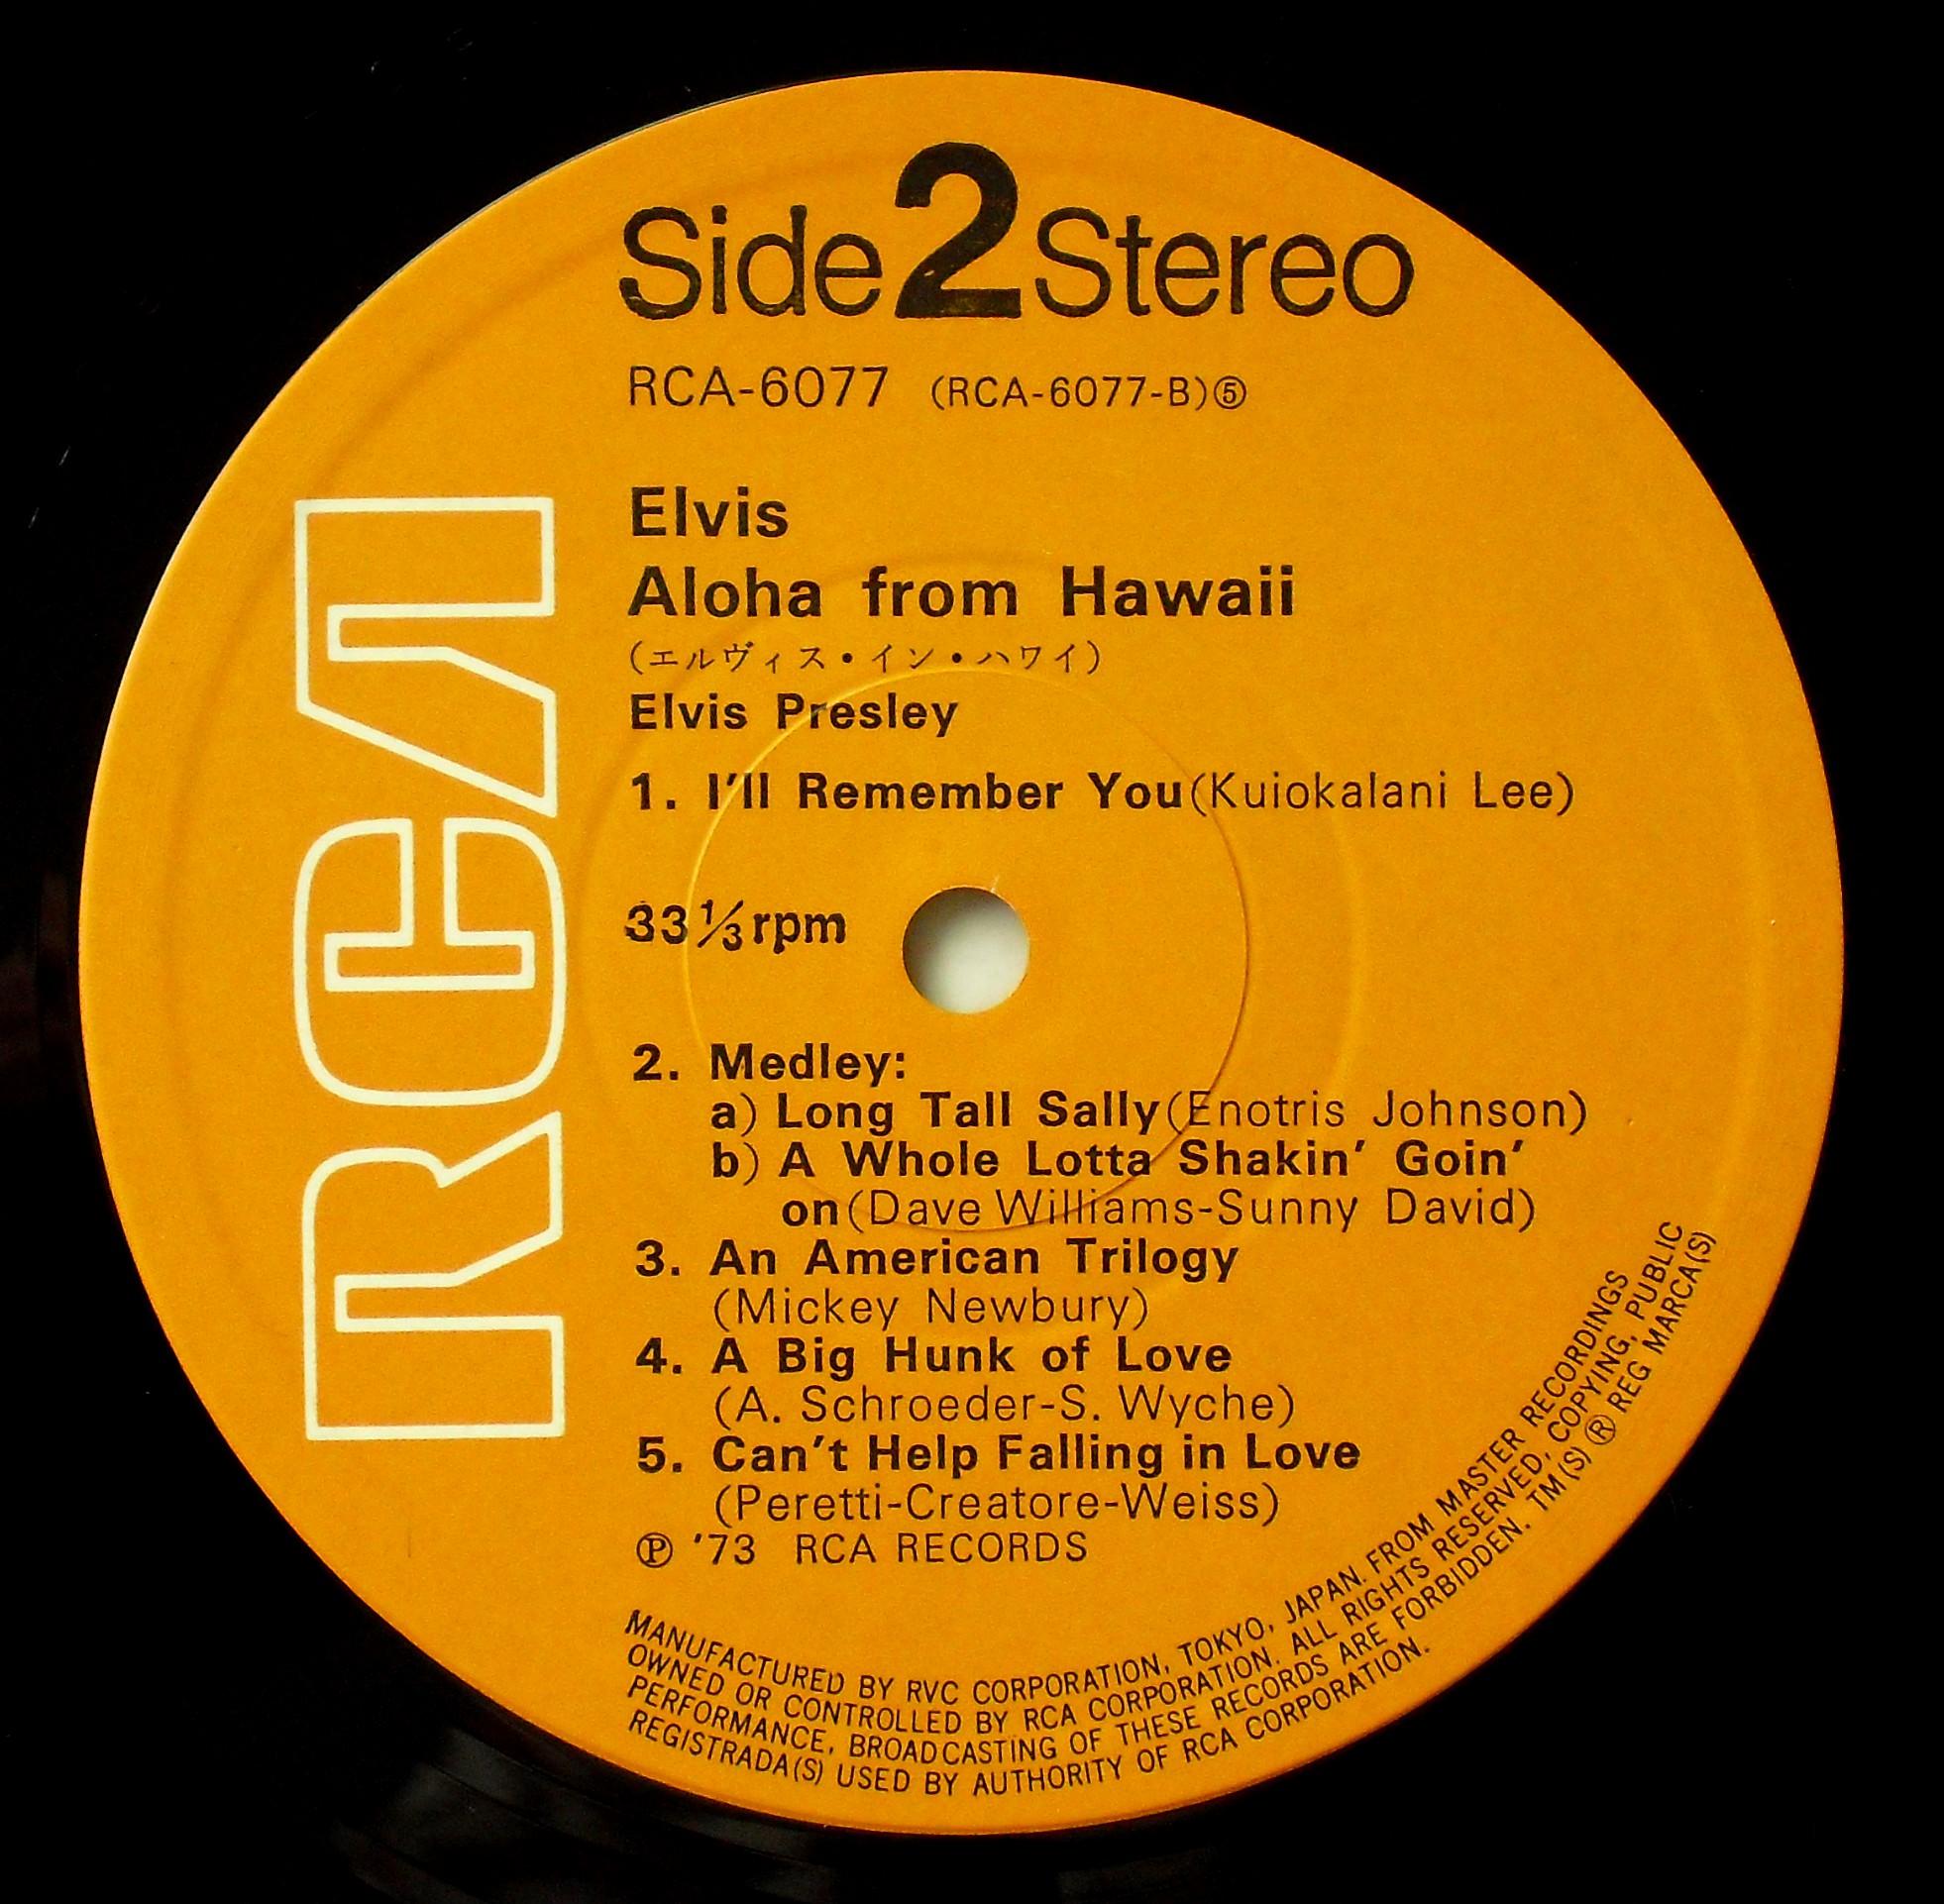 ALOHA FROM HAWAII VIA SATELLITE 11s4rzbgc